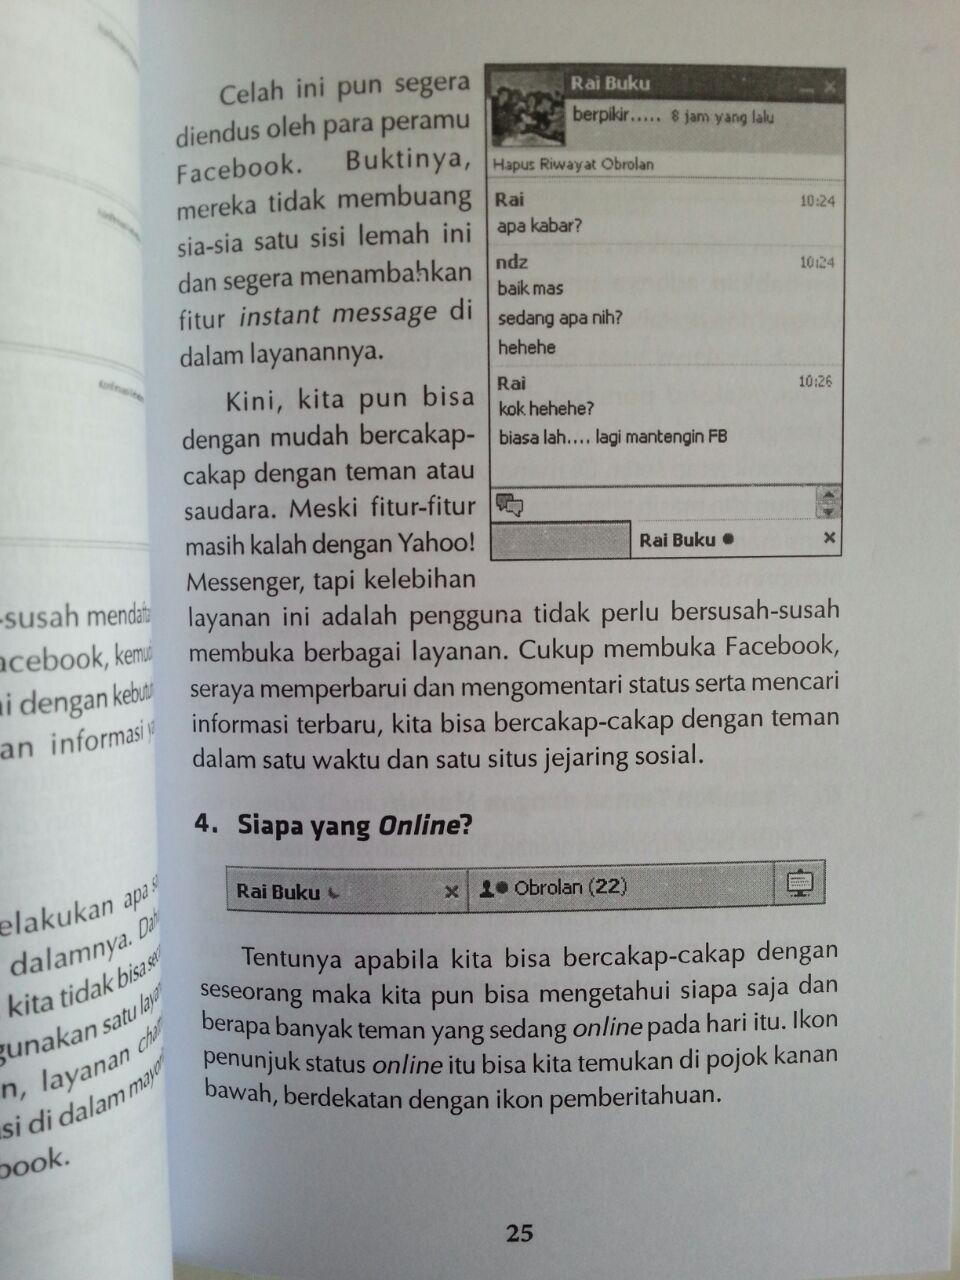 Buku Bahaya Facebook Bagaimana Berfacebook Dengan Aman Sehat Islami isi 3